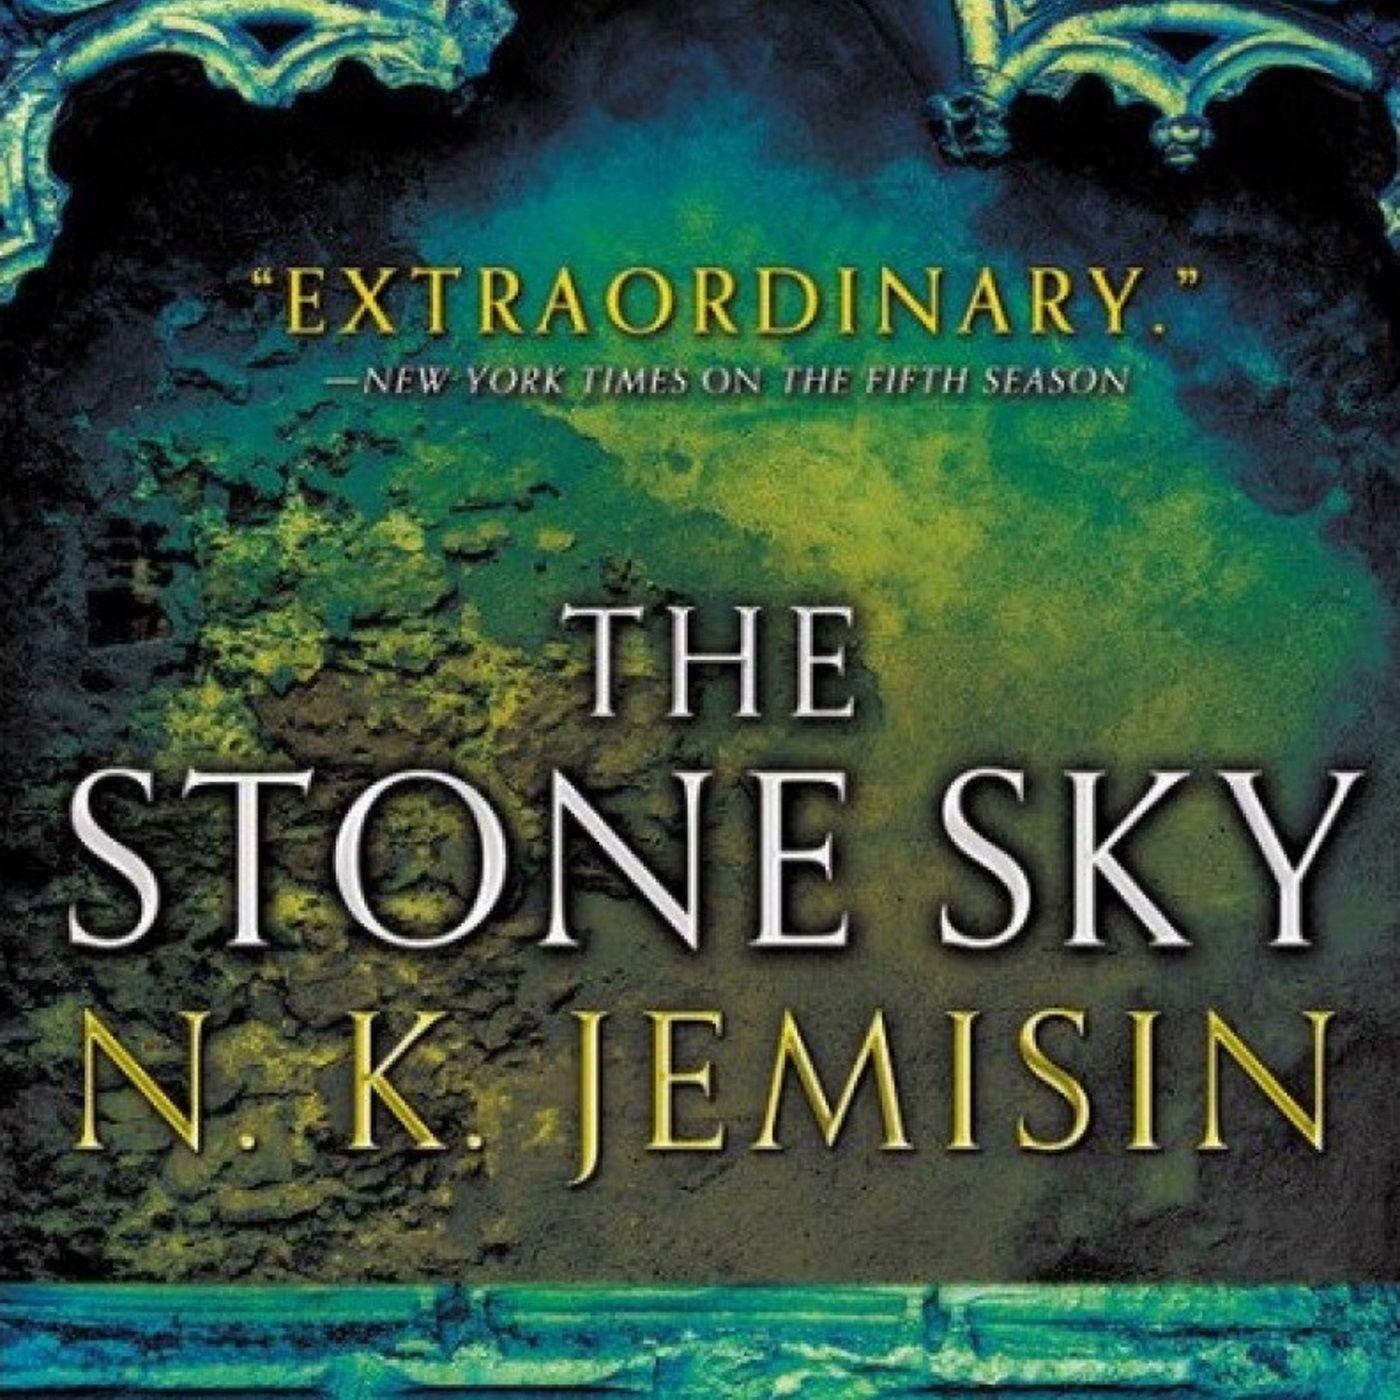 Book-Space! #7. The Stone Sky by N.K. Jemisin